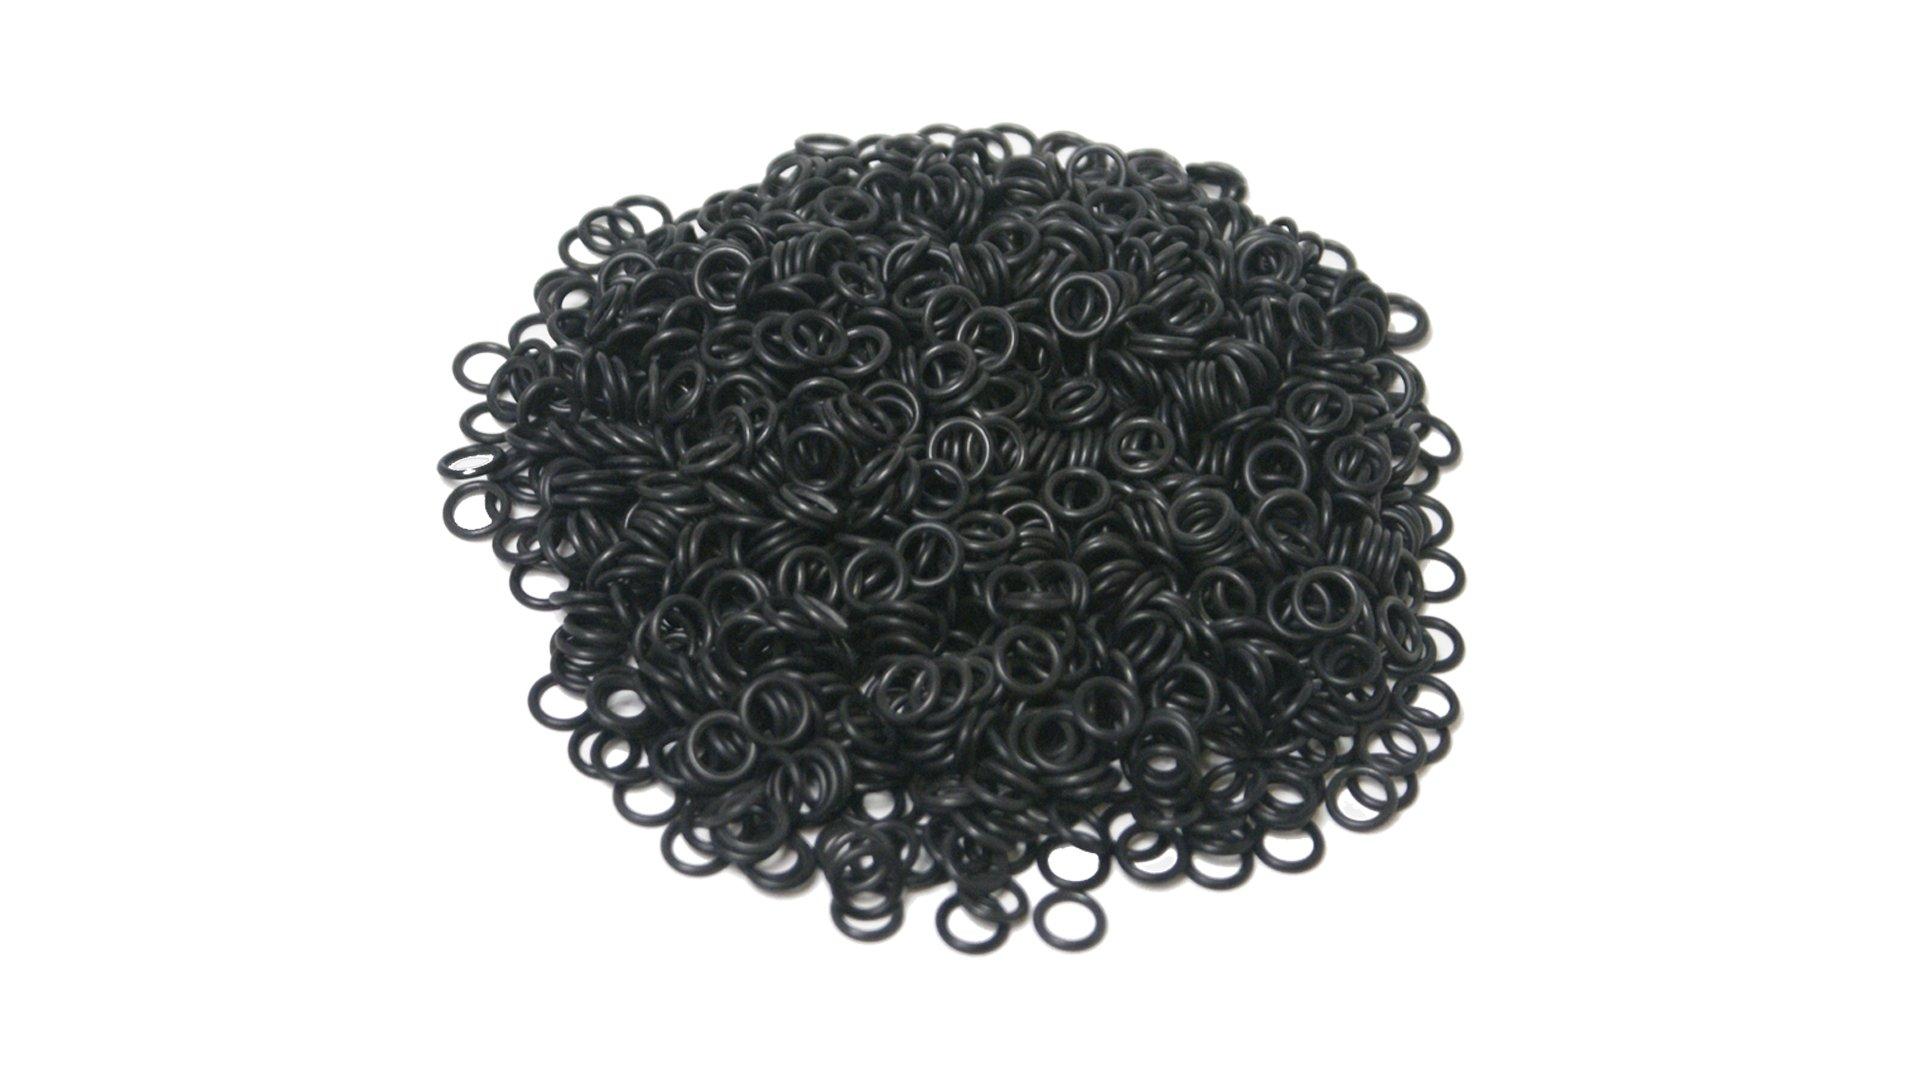 Sterling Seal OR90BLKBUN113X250 113 BUNA/NBR O-Ring, Nitrile, 90 Durometer Hardness (Pack of 250)